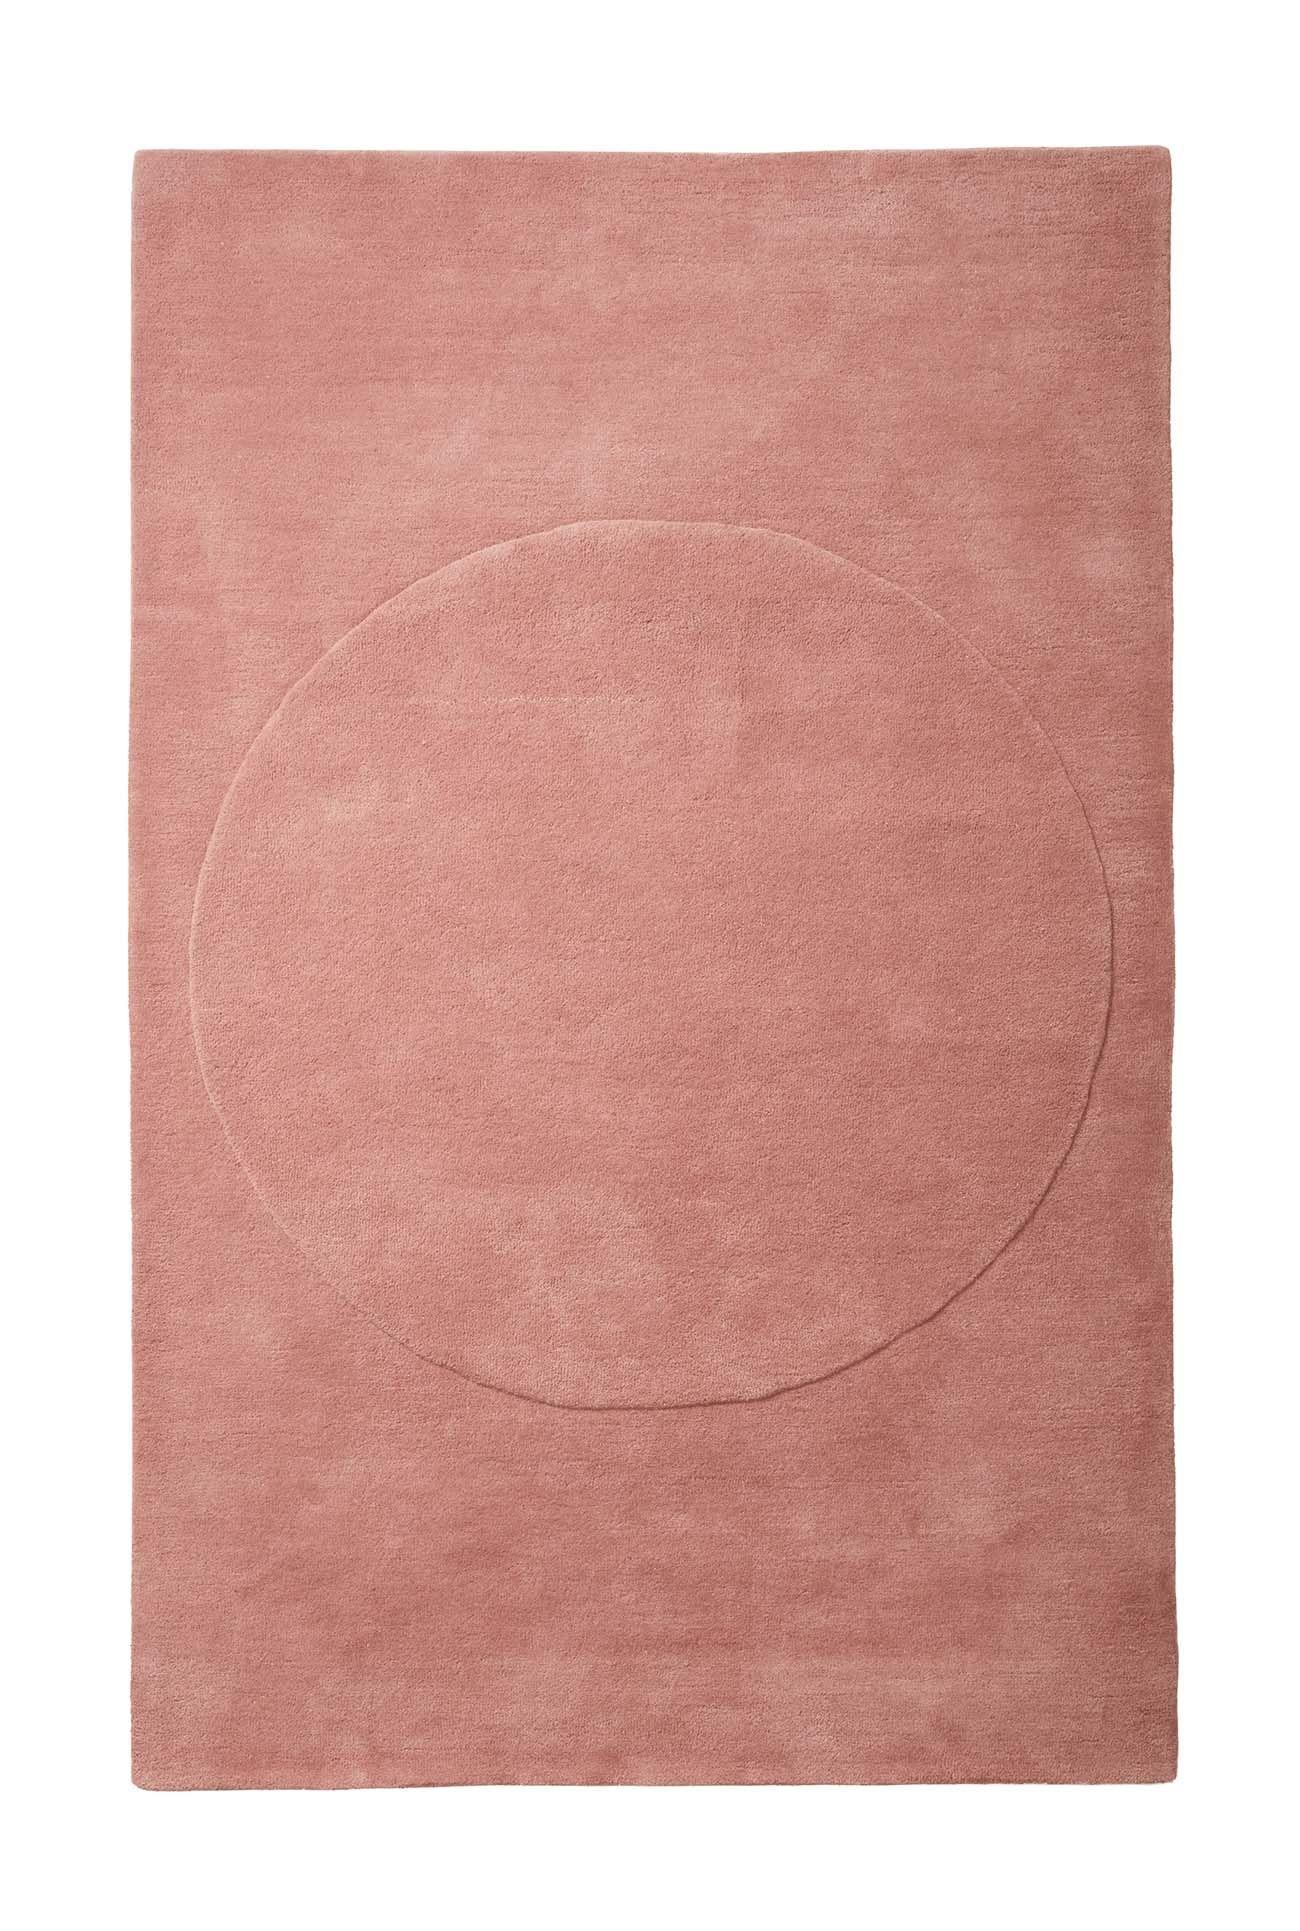 AelfieXProba-Rugs-Col2-single highres4   地毯   Pinterest   Motive ...